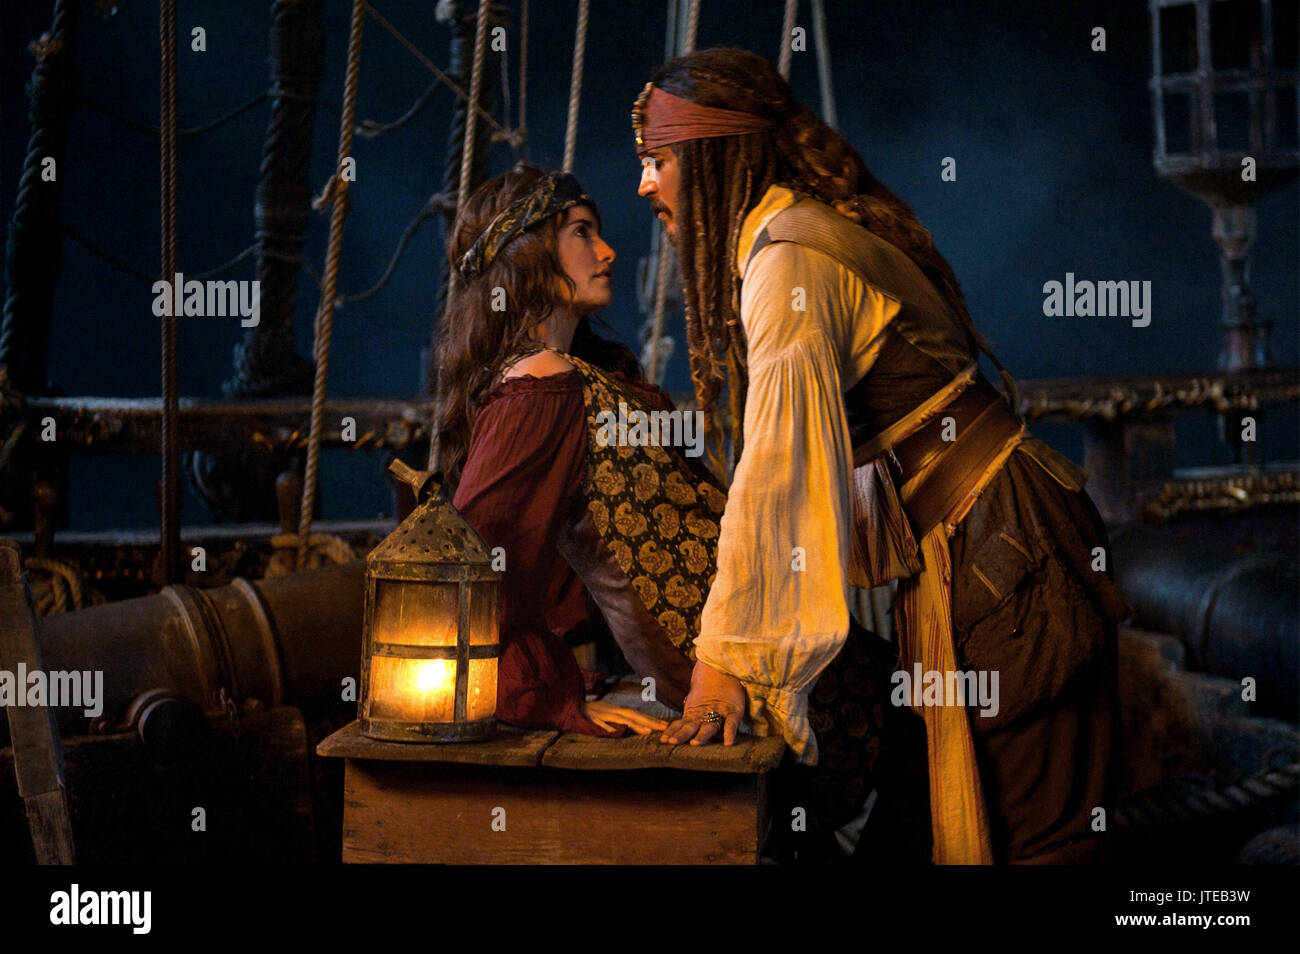 Cruz Depp Pirates Of The Caribbean On Stranger Tides 2011 Stock Photo Alamy